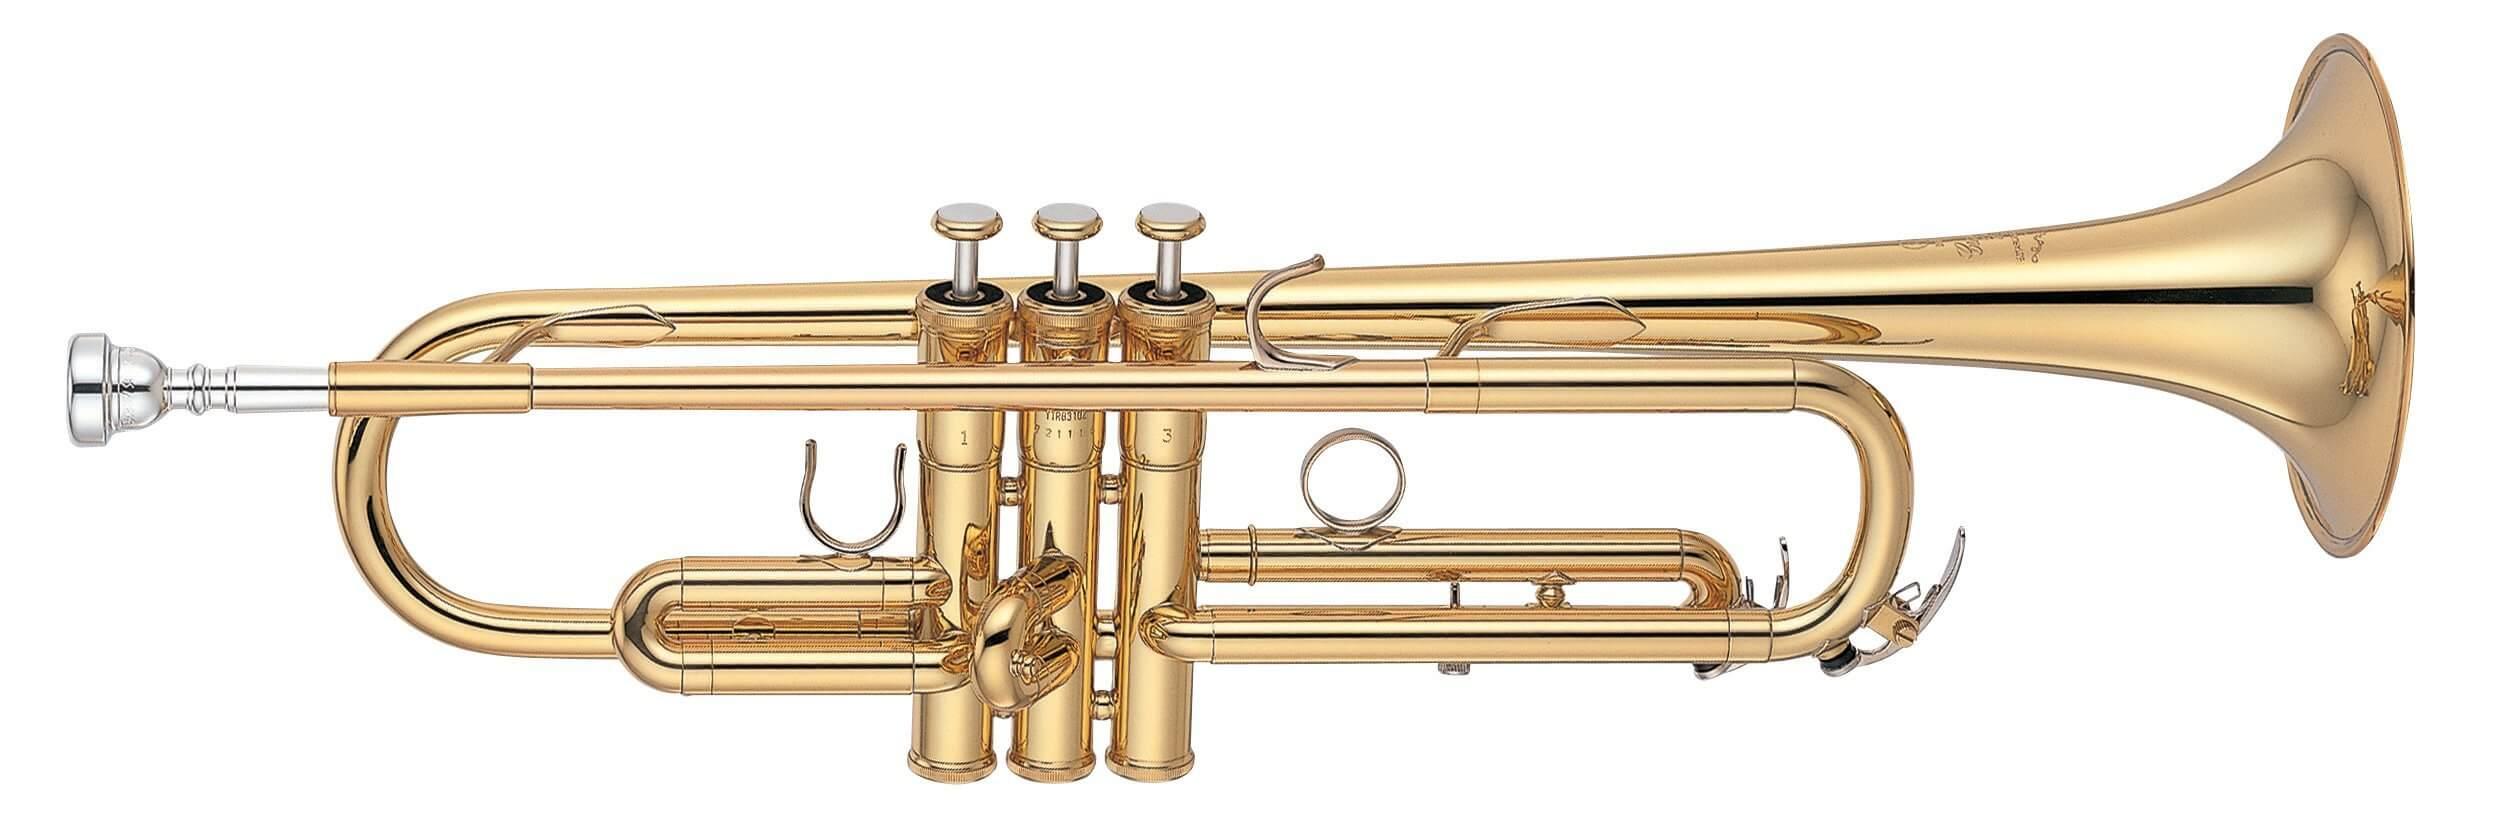 Trompeta Yamaha Ytr 8310Z Lacada